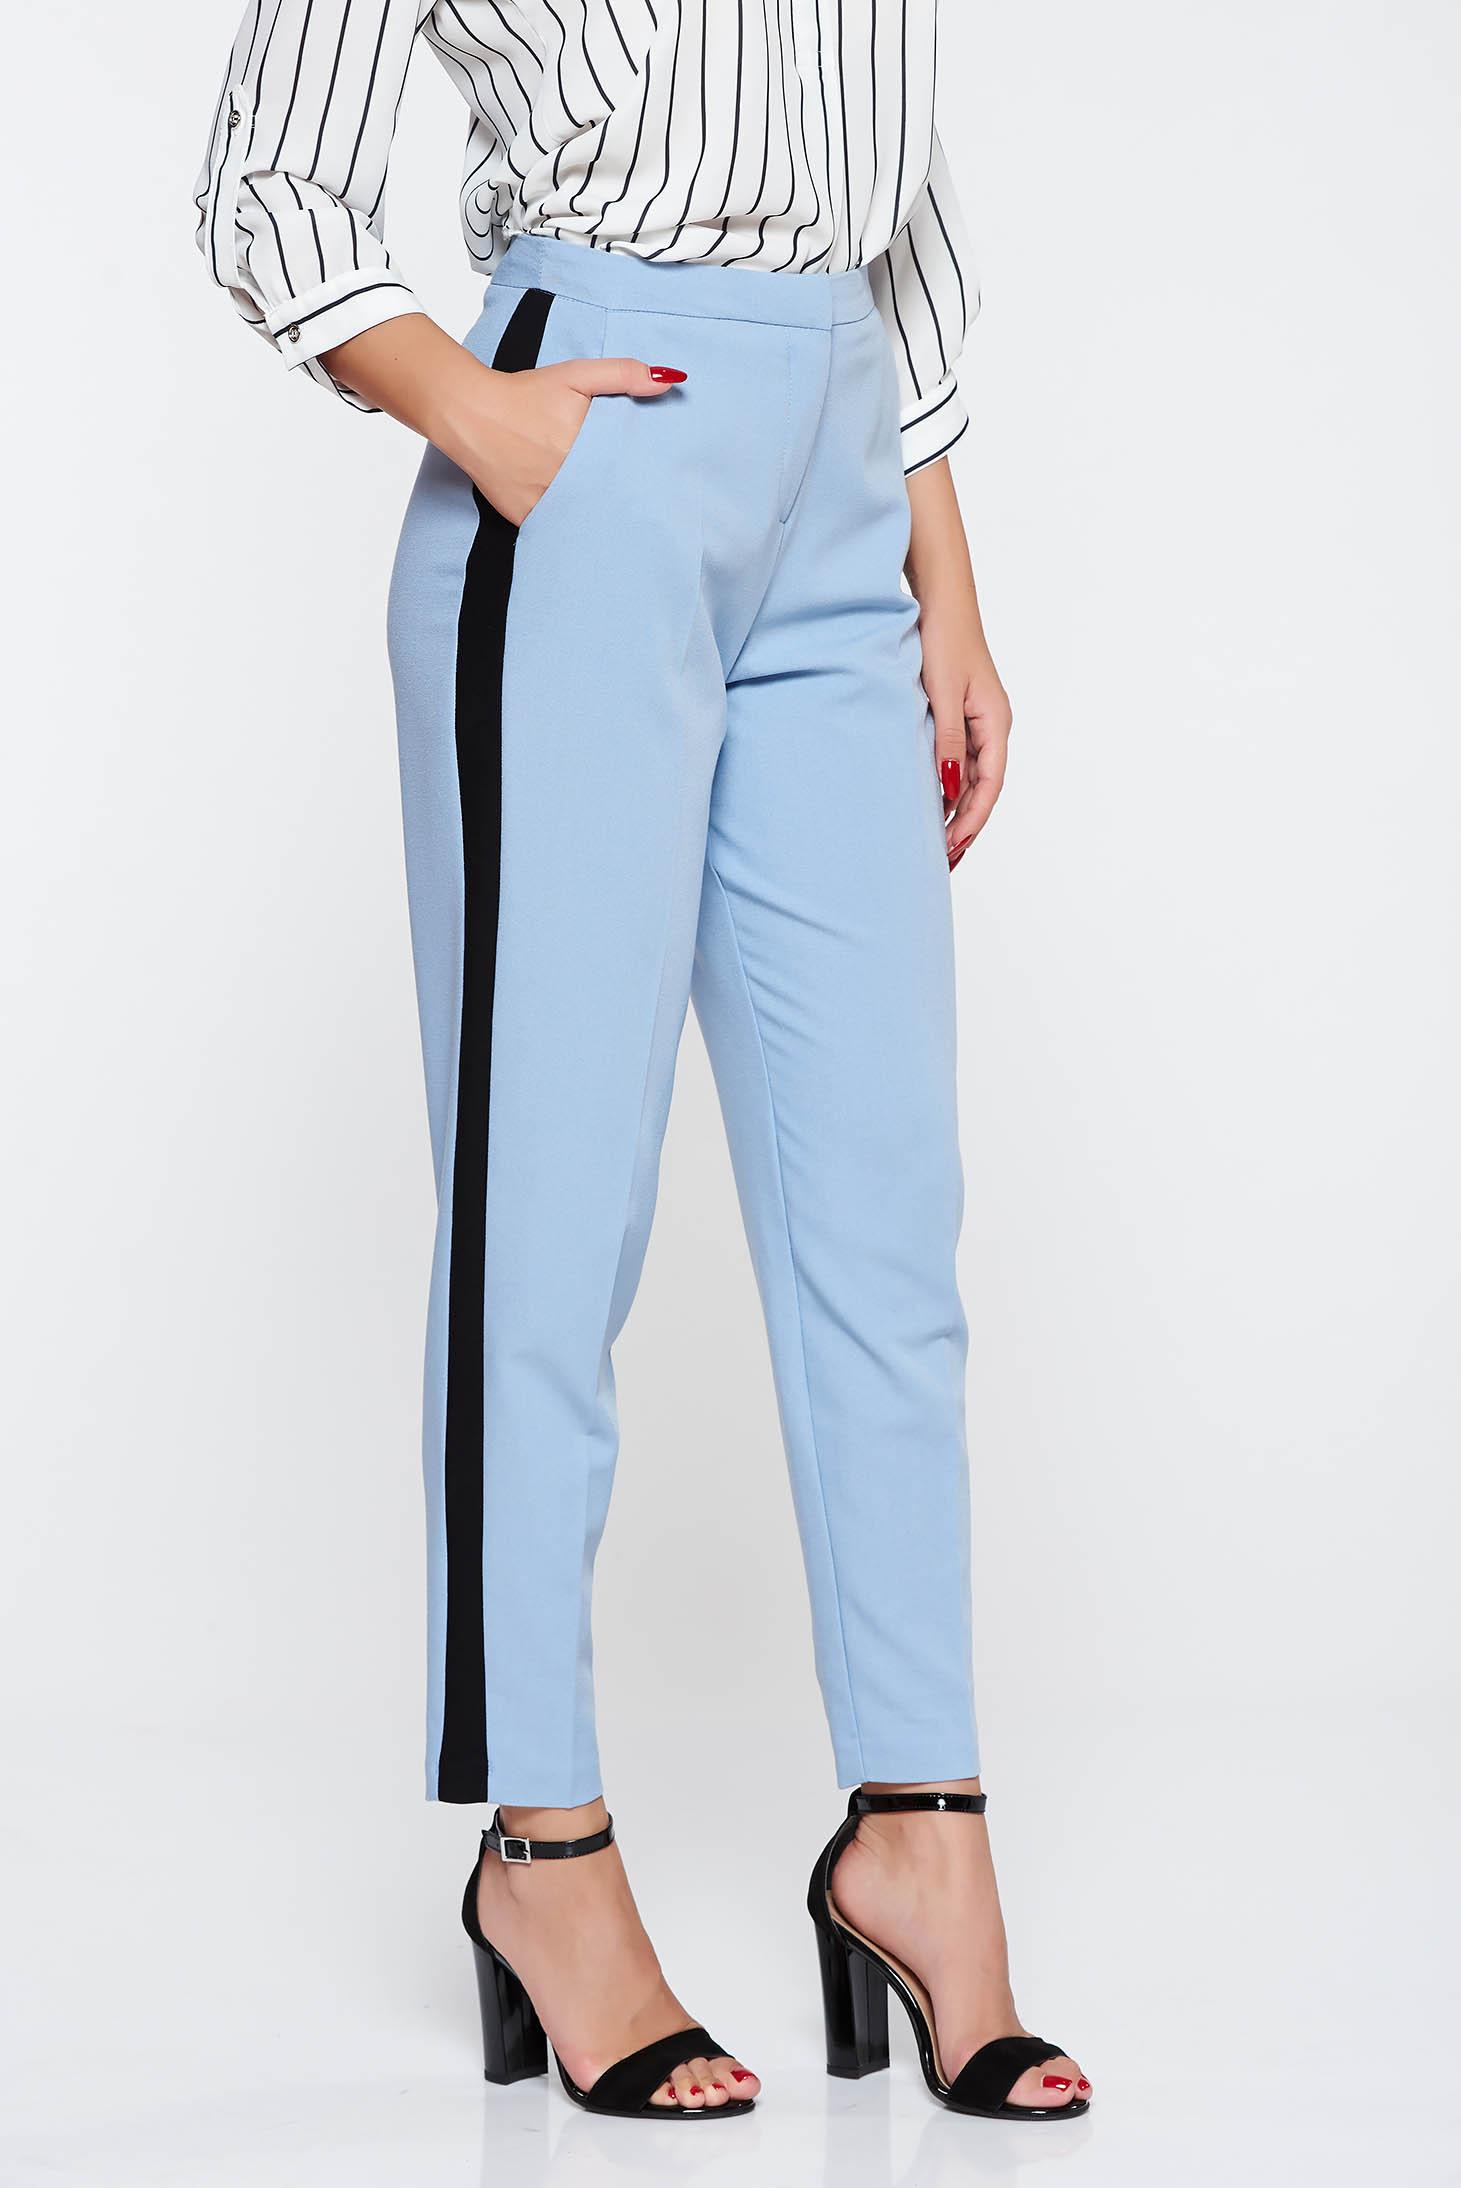 Pantaloni albastri deschis eleganti cu talie medie din stofa subtire usor elastica